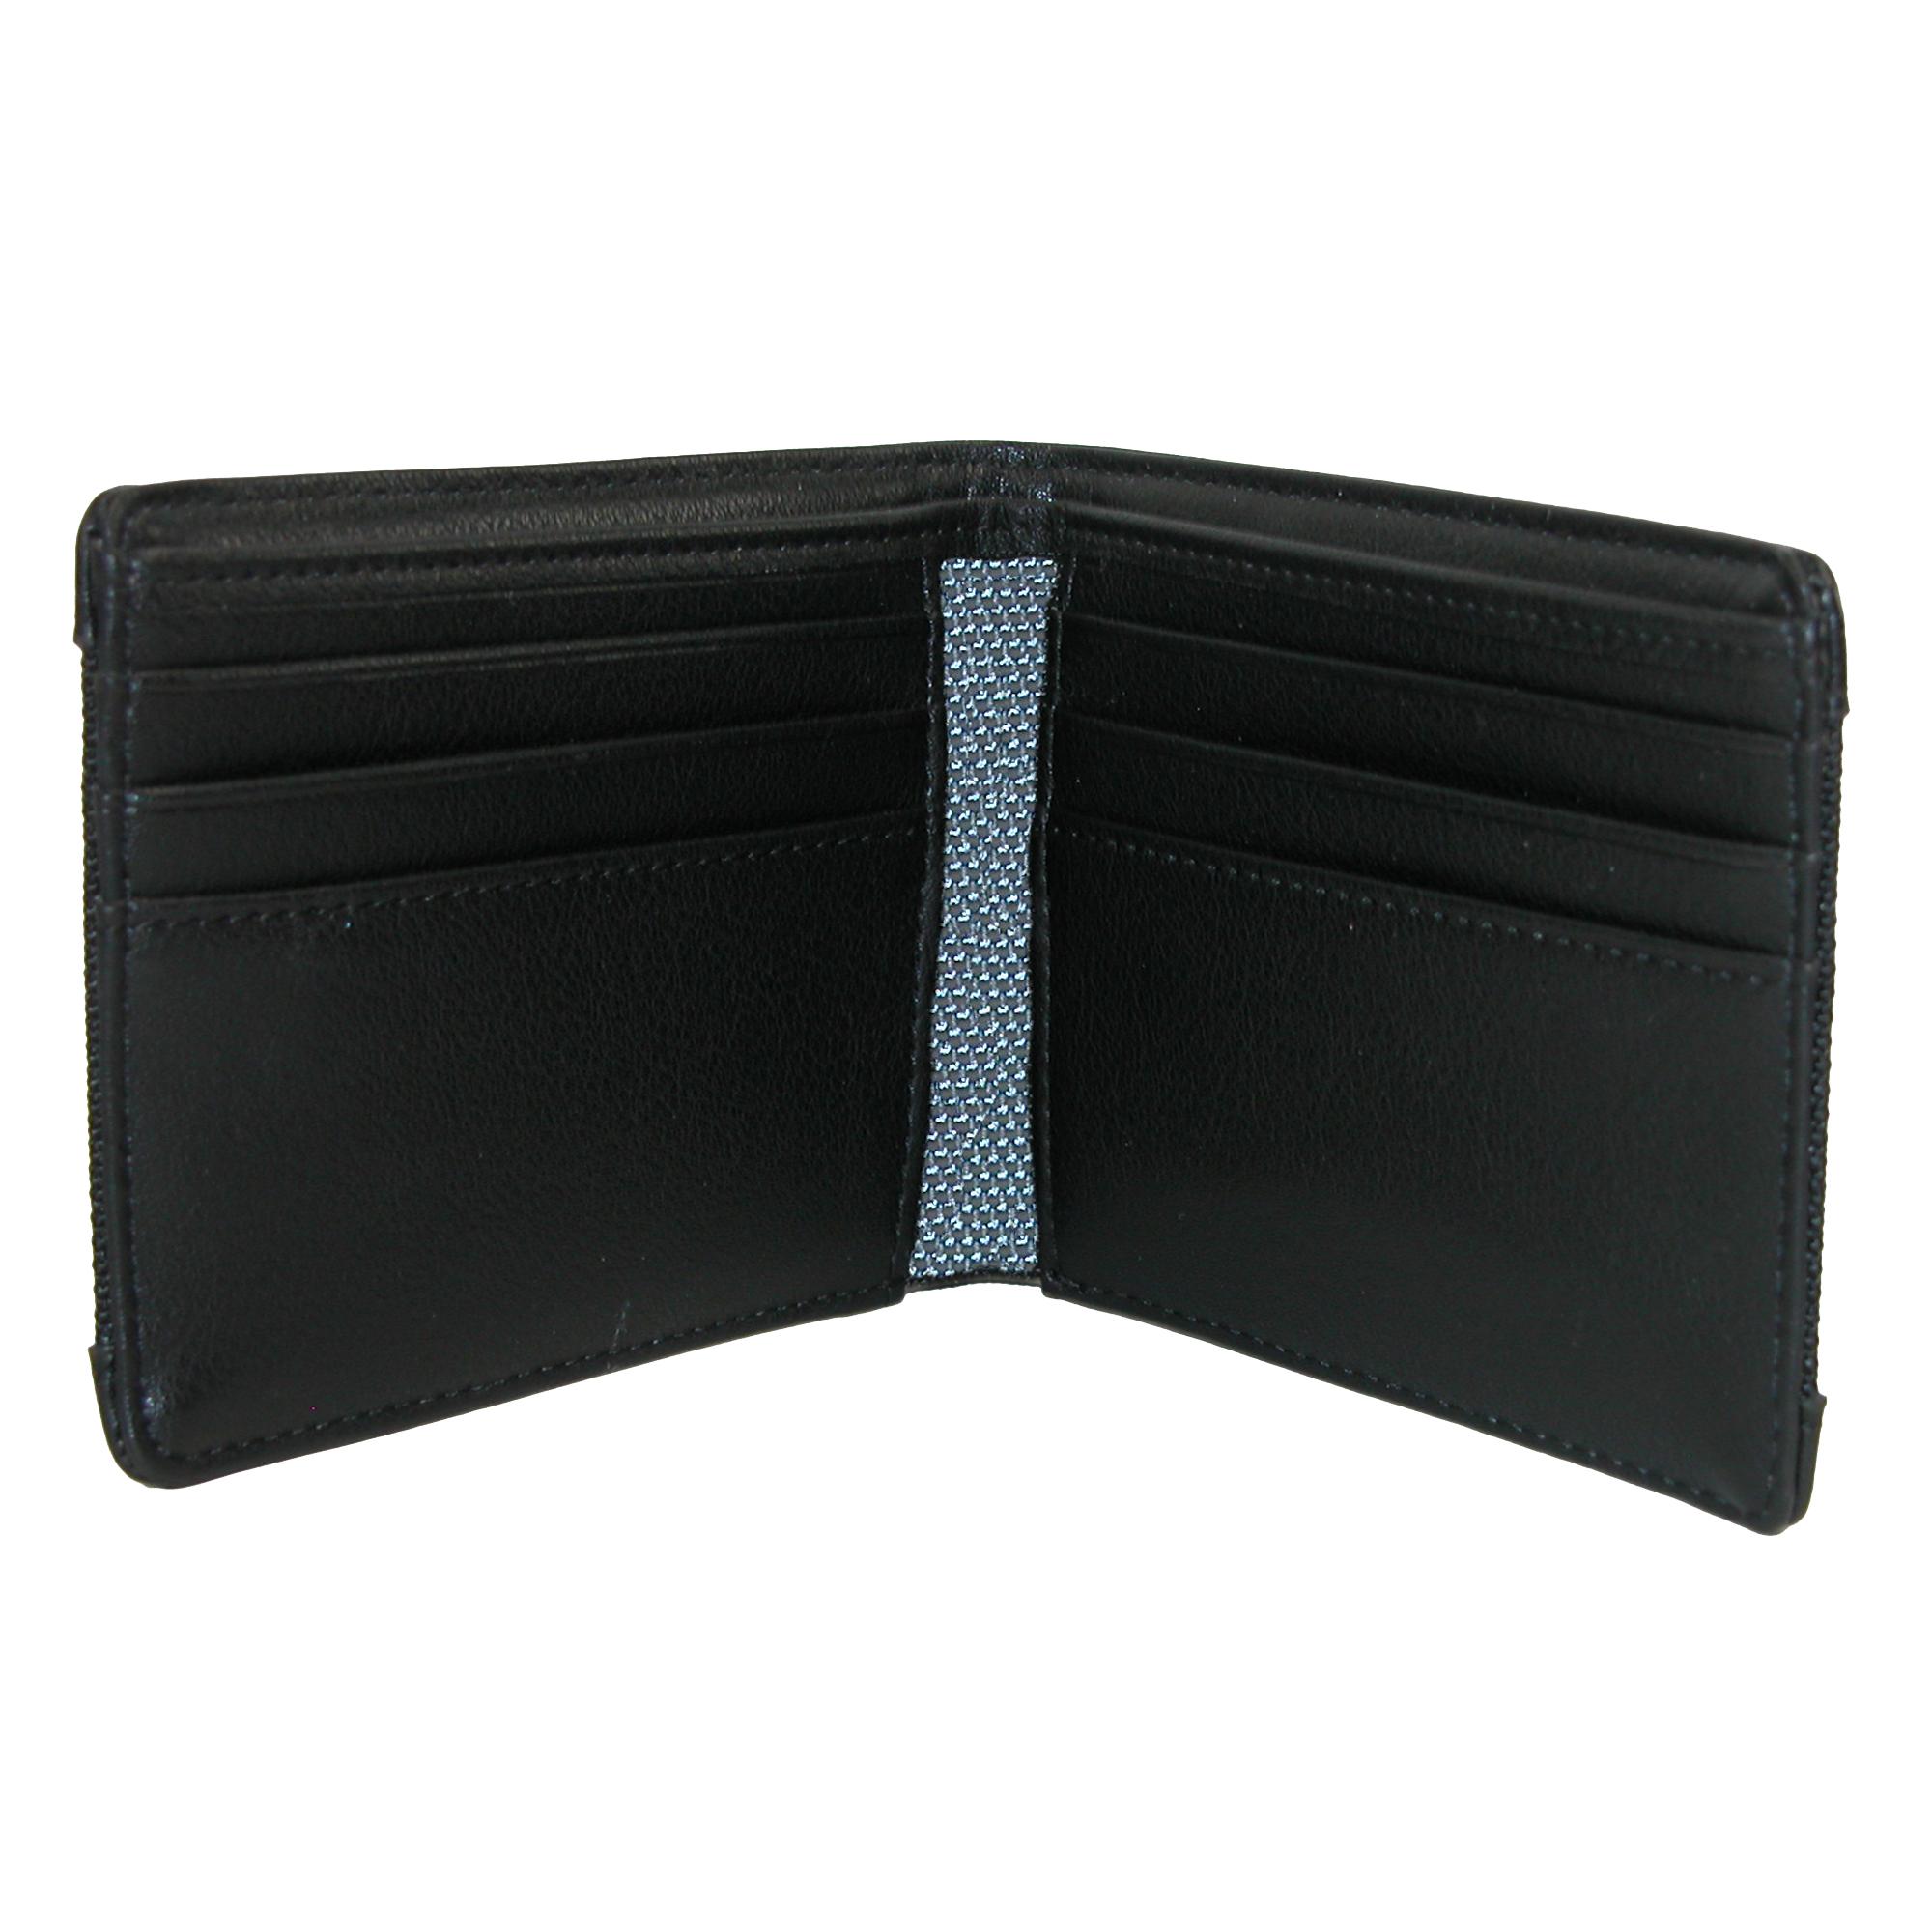 NDK Men's RFID Protected Bifold Wallet - image 2 of 4